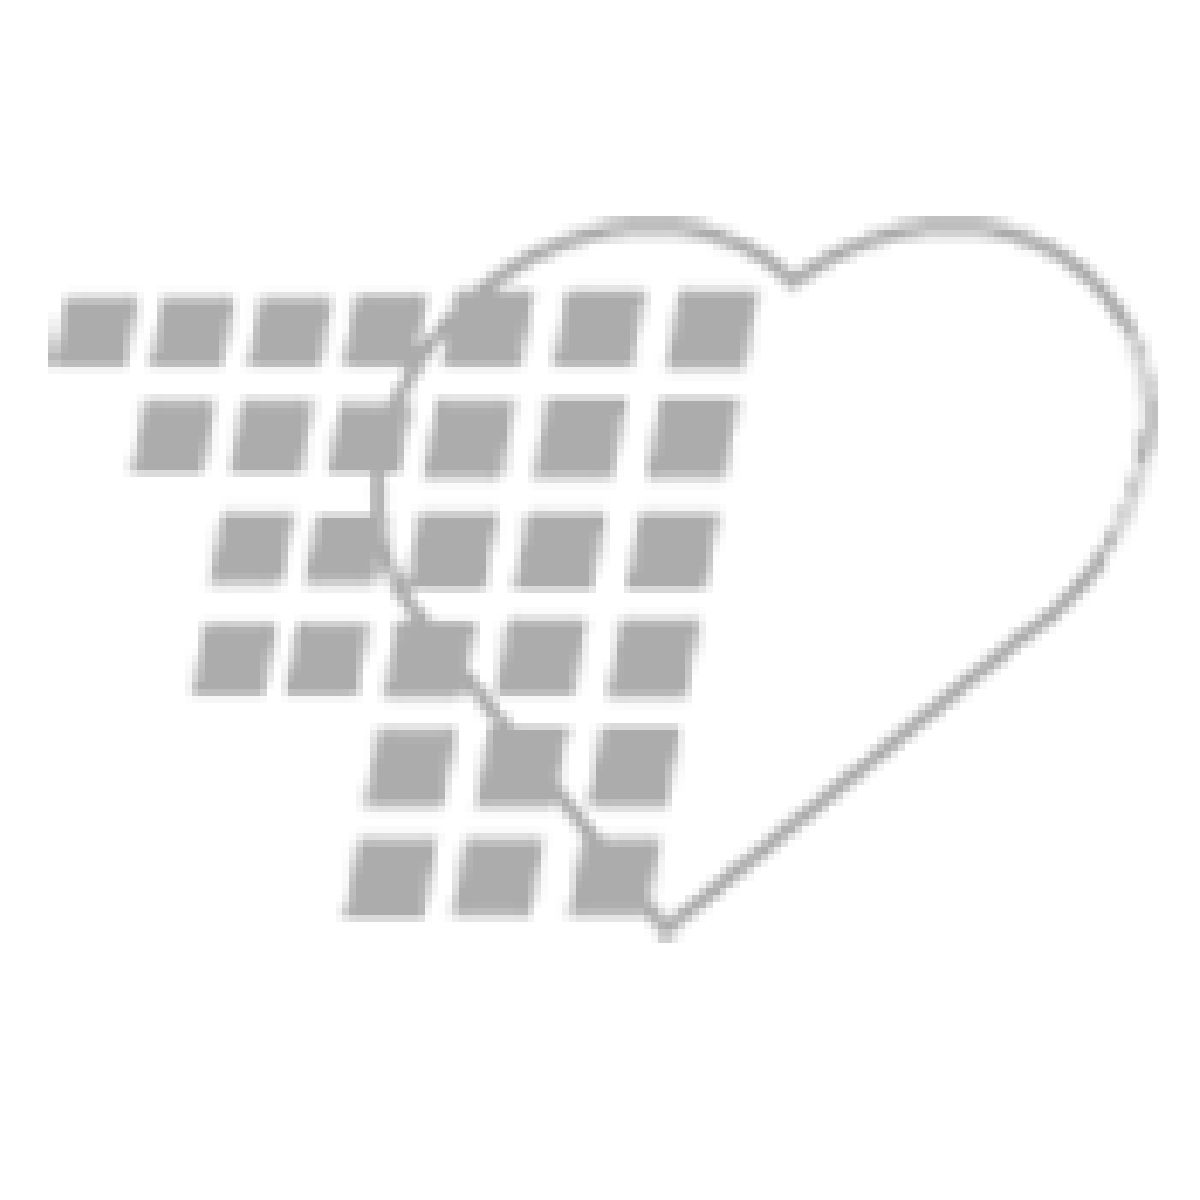 03-75-1413 - Critical Cover® GenPro® Beard Covers